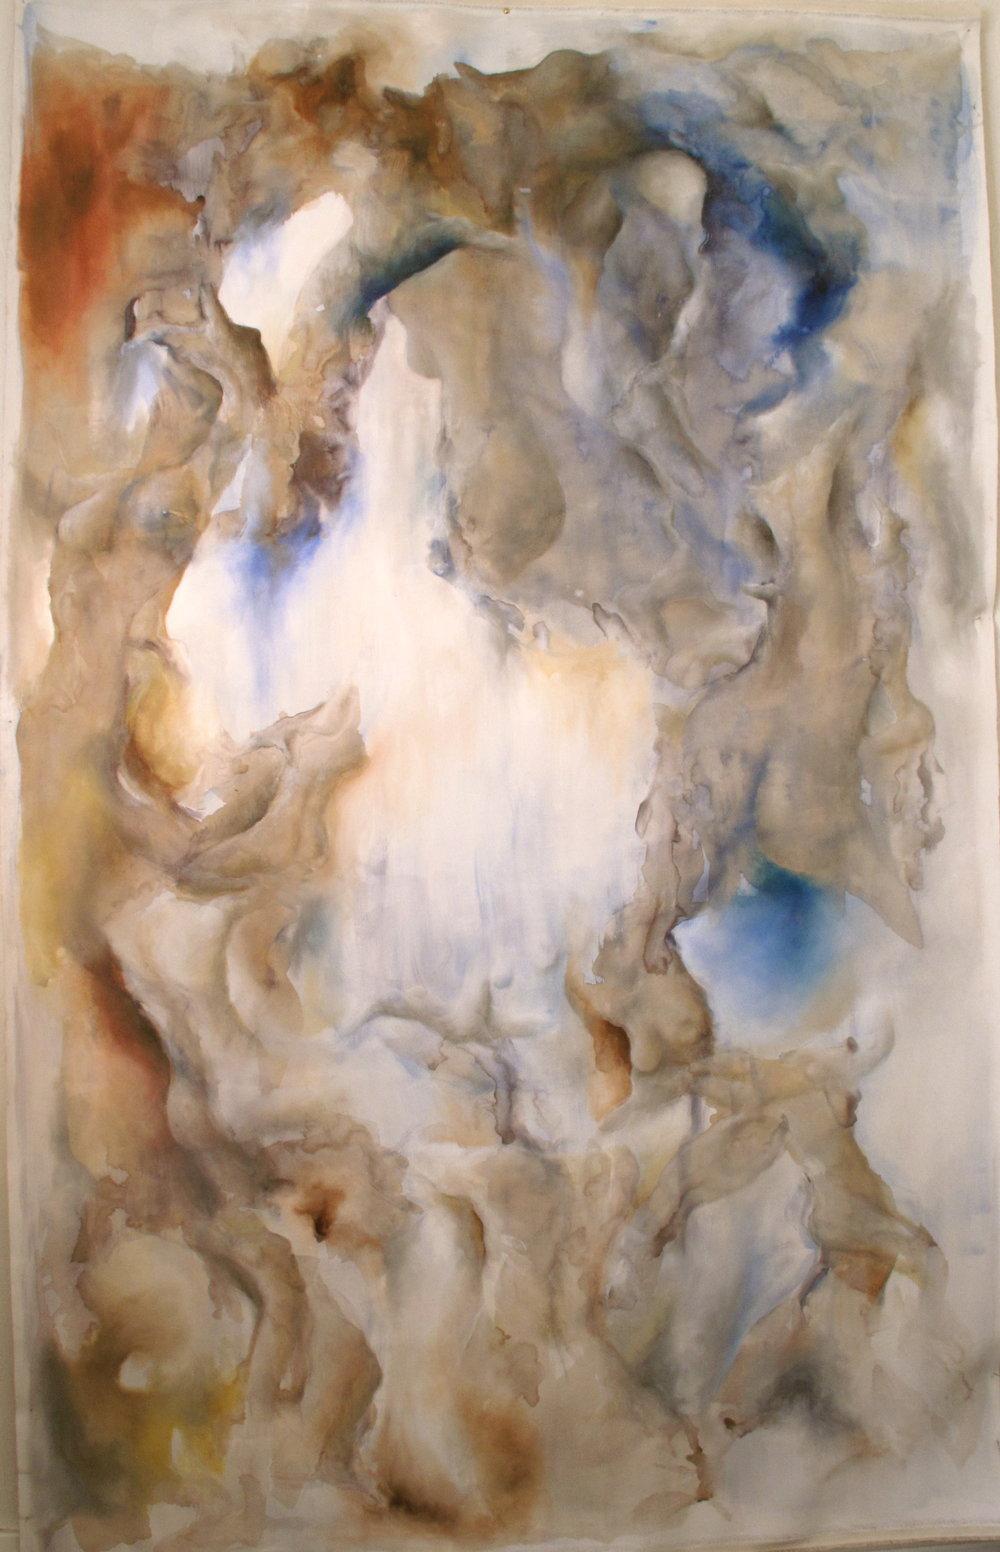 Flood.  2.1 x 1.2m Ink, Pastel & Oil on canvas. 2016